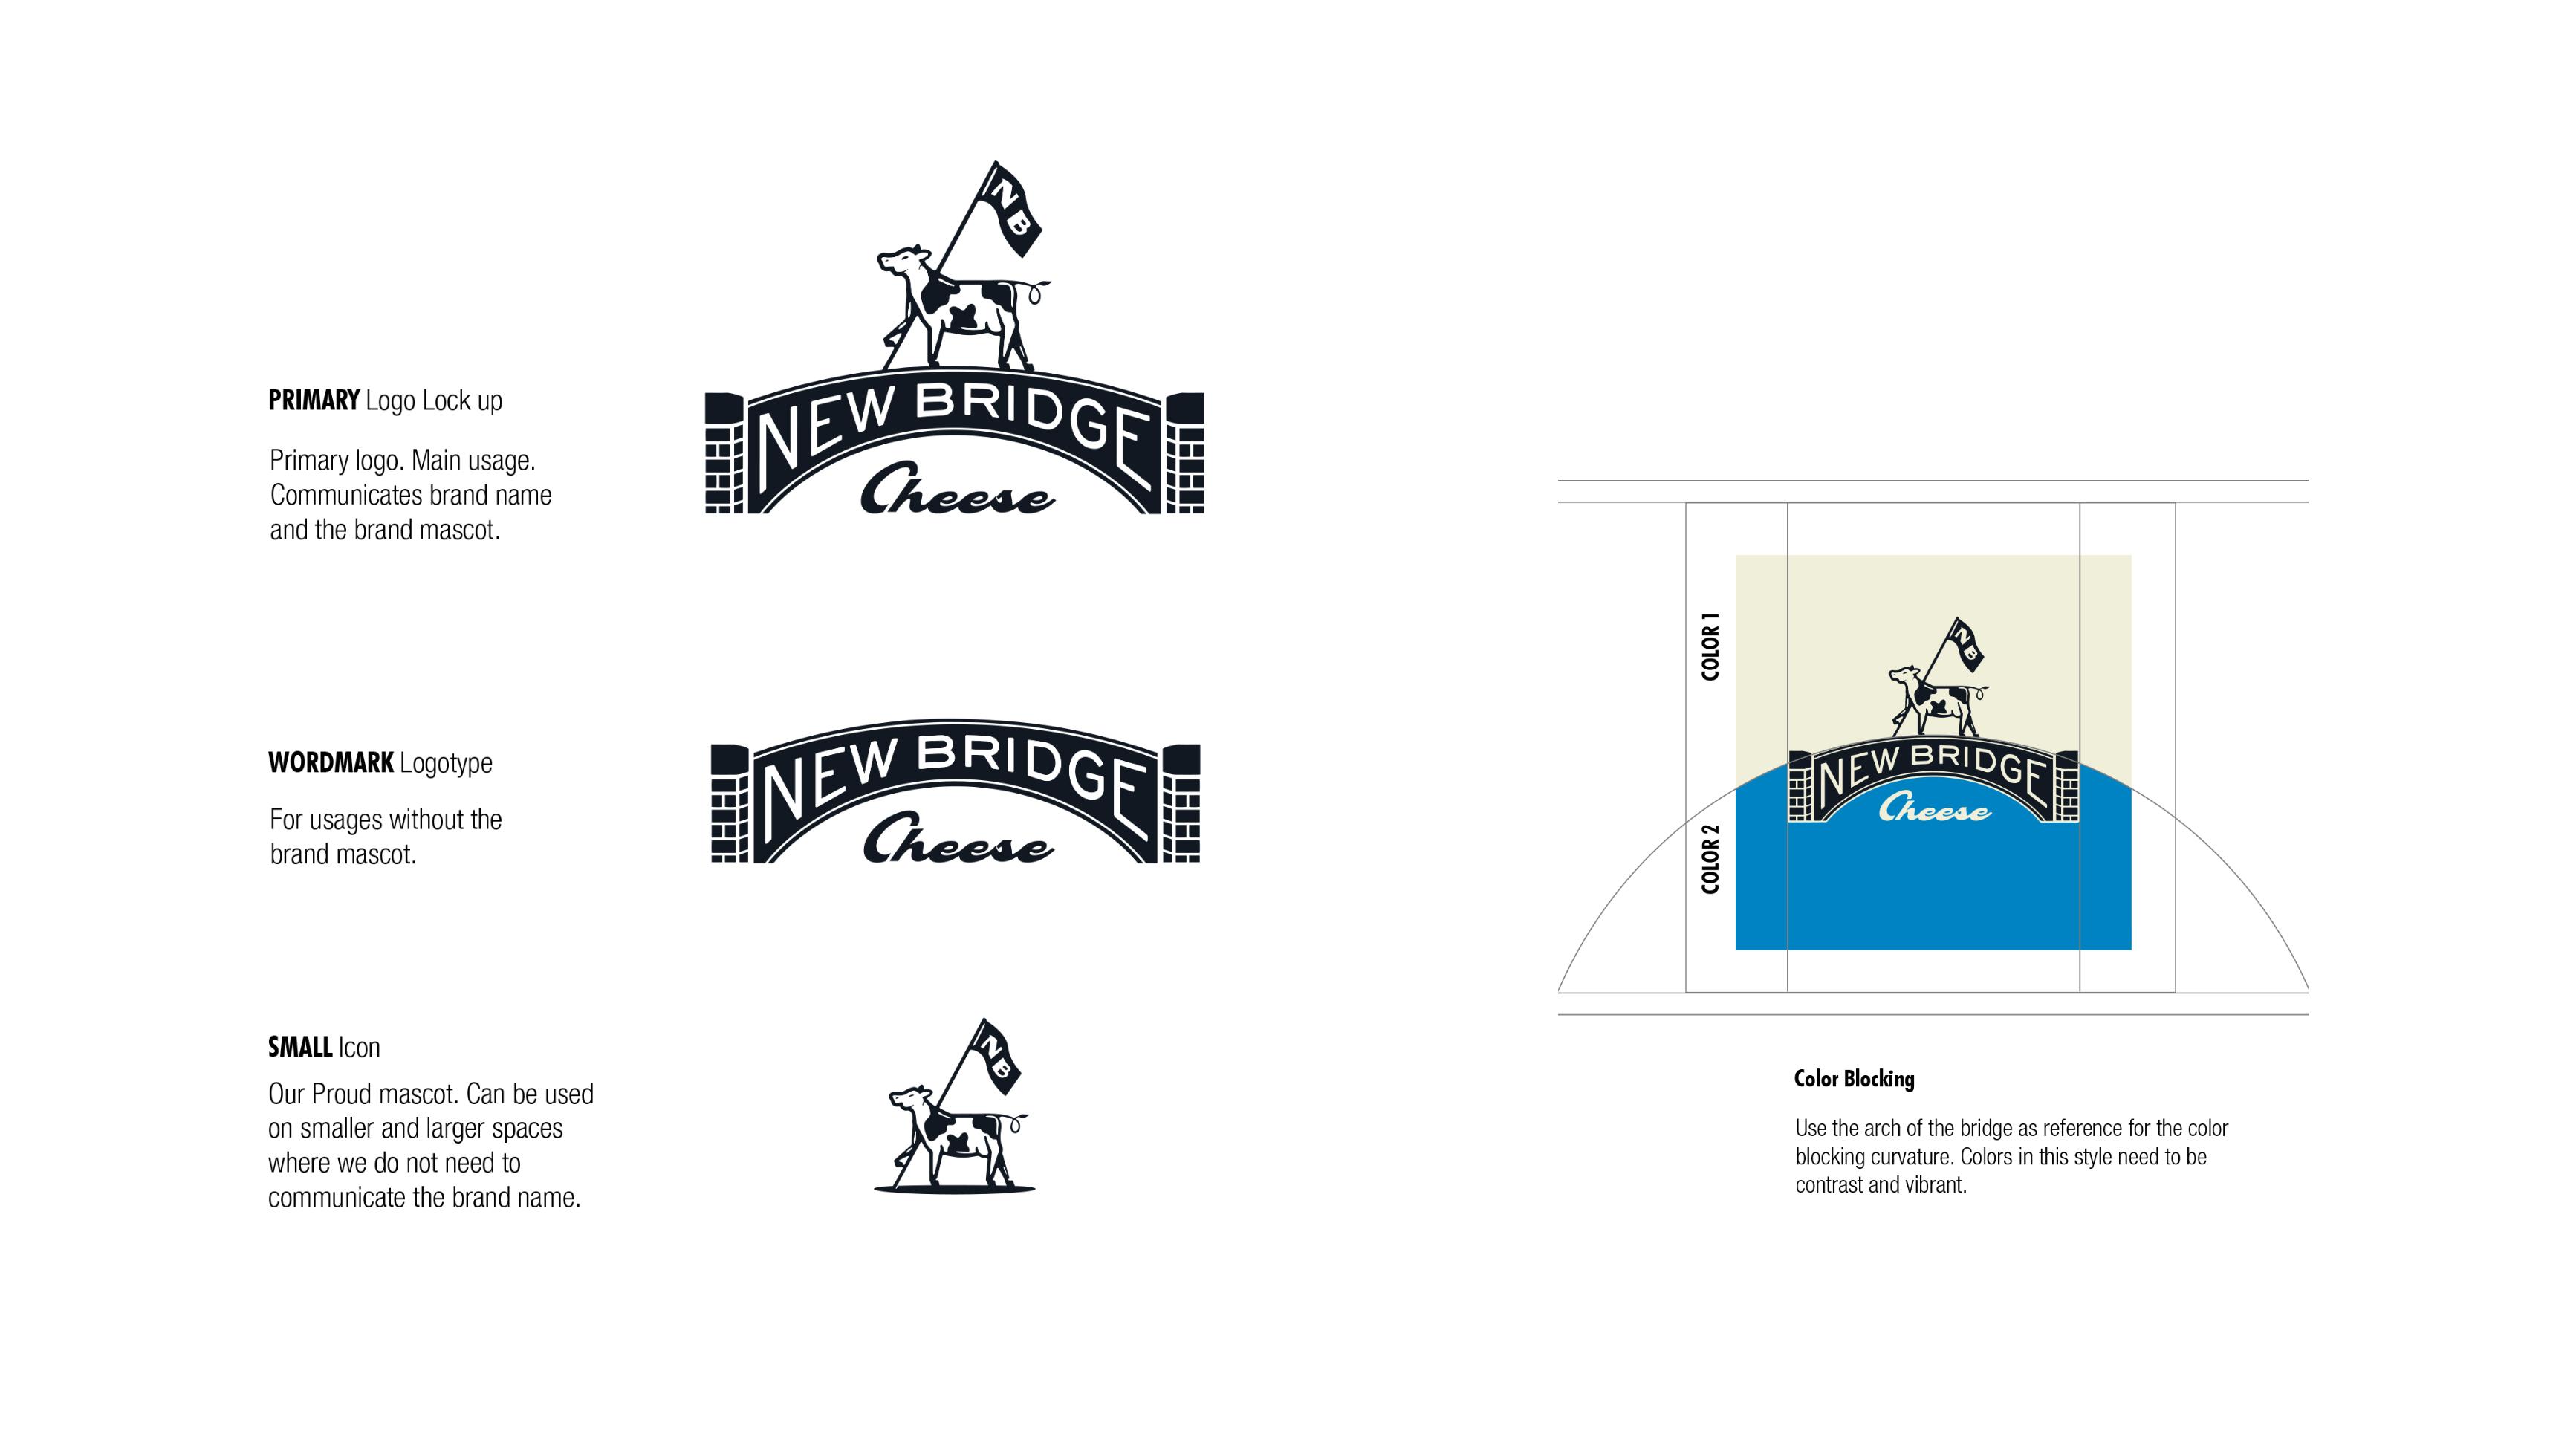 guideline-new-bridge-cheese-design-exploration-zeki-michael-design-cheese-cow-spread-tub-sku-range-agency-branding copy